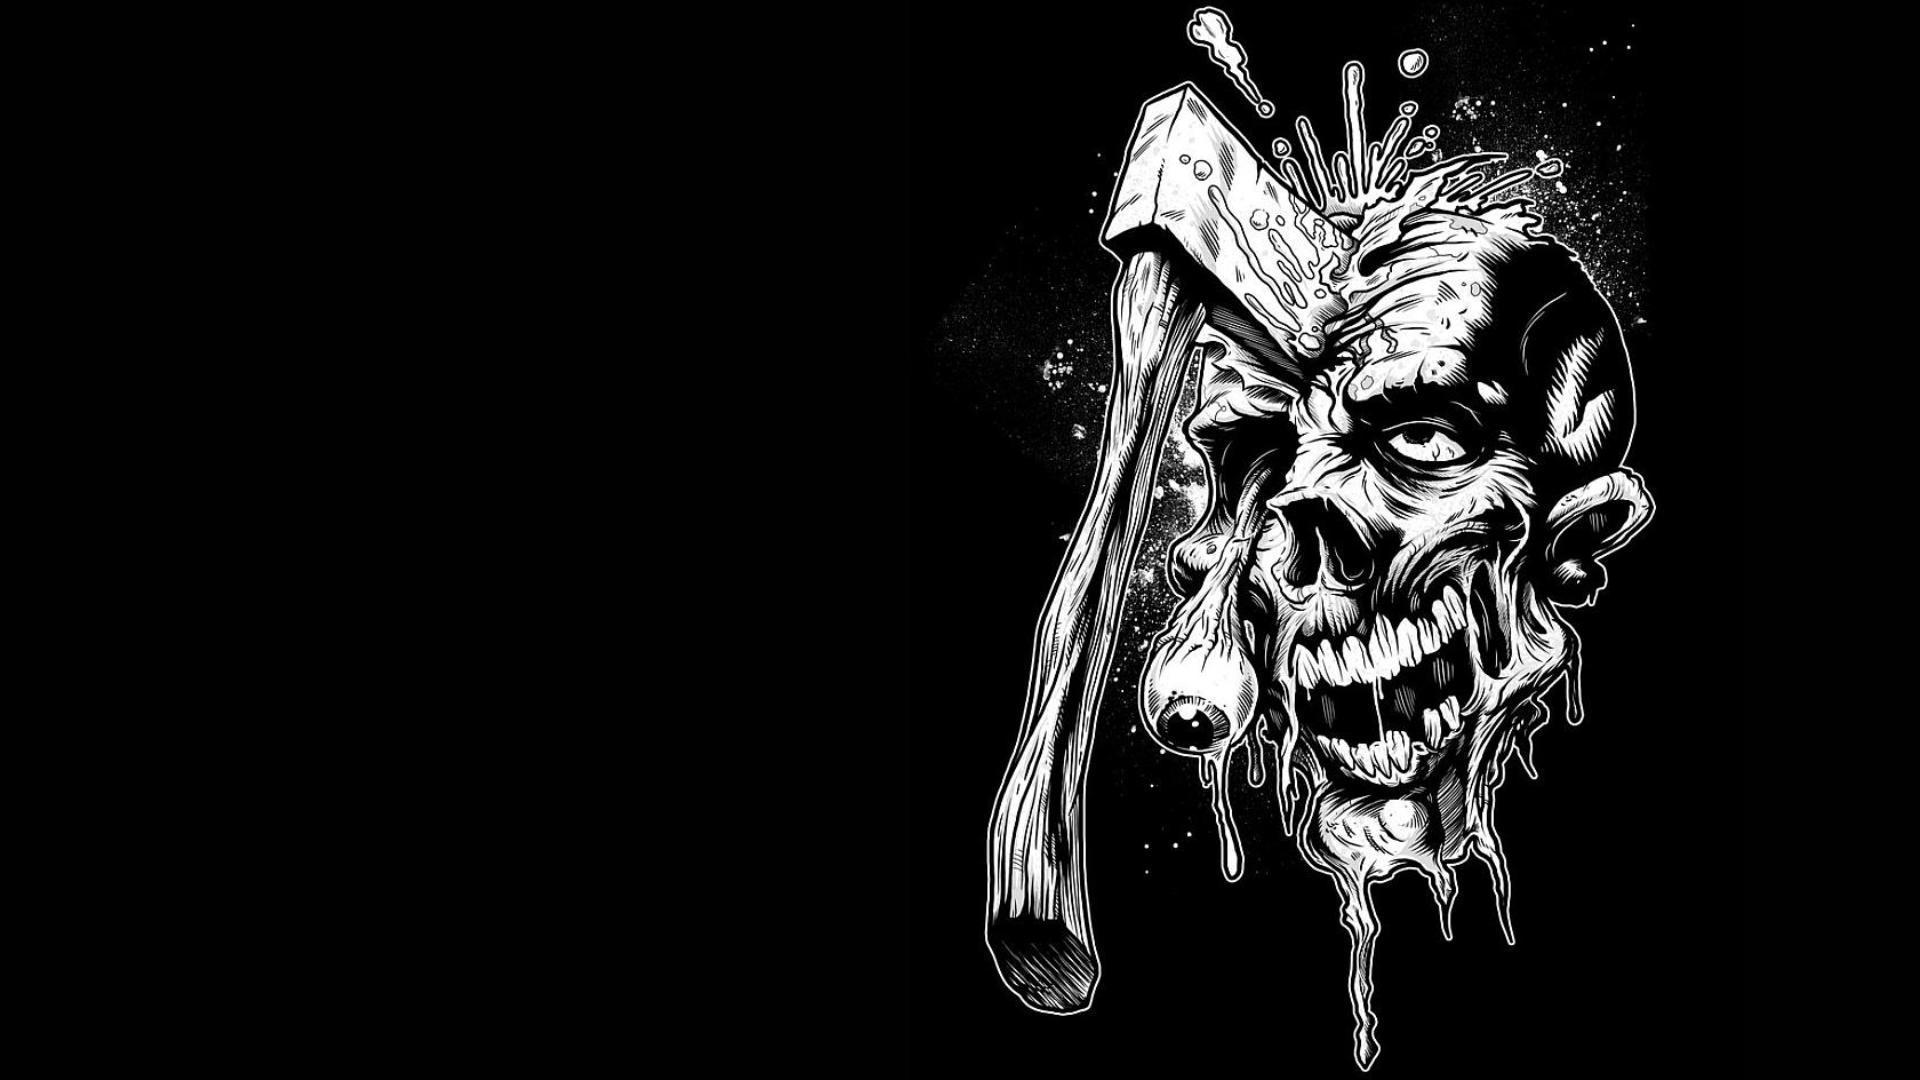 Dark zombie horror skull weapon wallpaper   1920x1080 ...